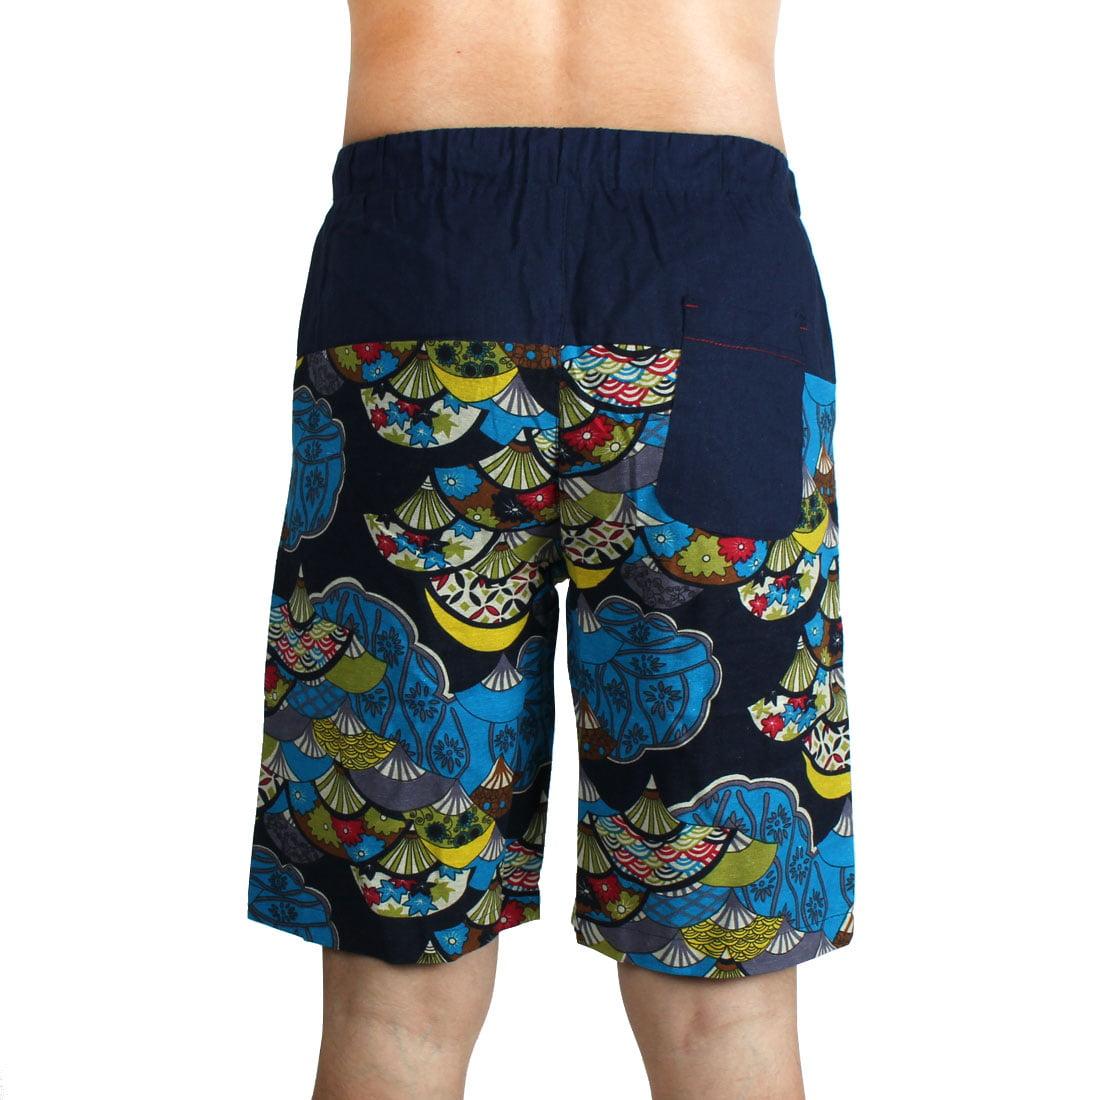 e59ef61fbc Men Outdoor Summer Linen Beach Surfing Swimming Shorts Casual Swim ...